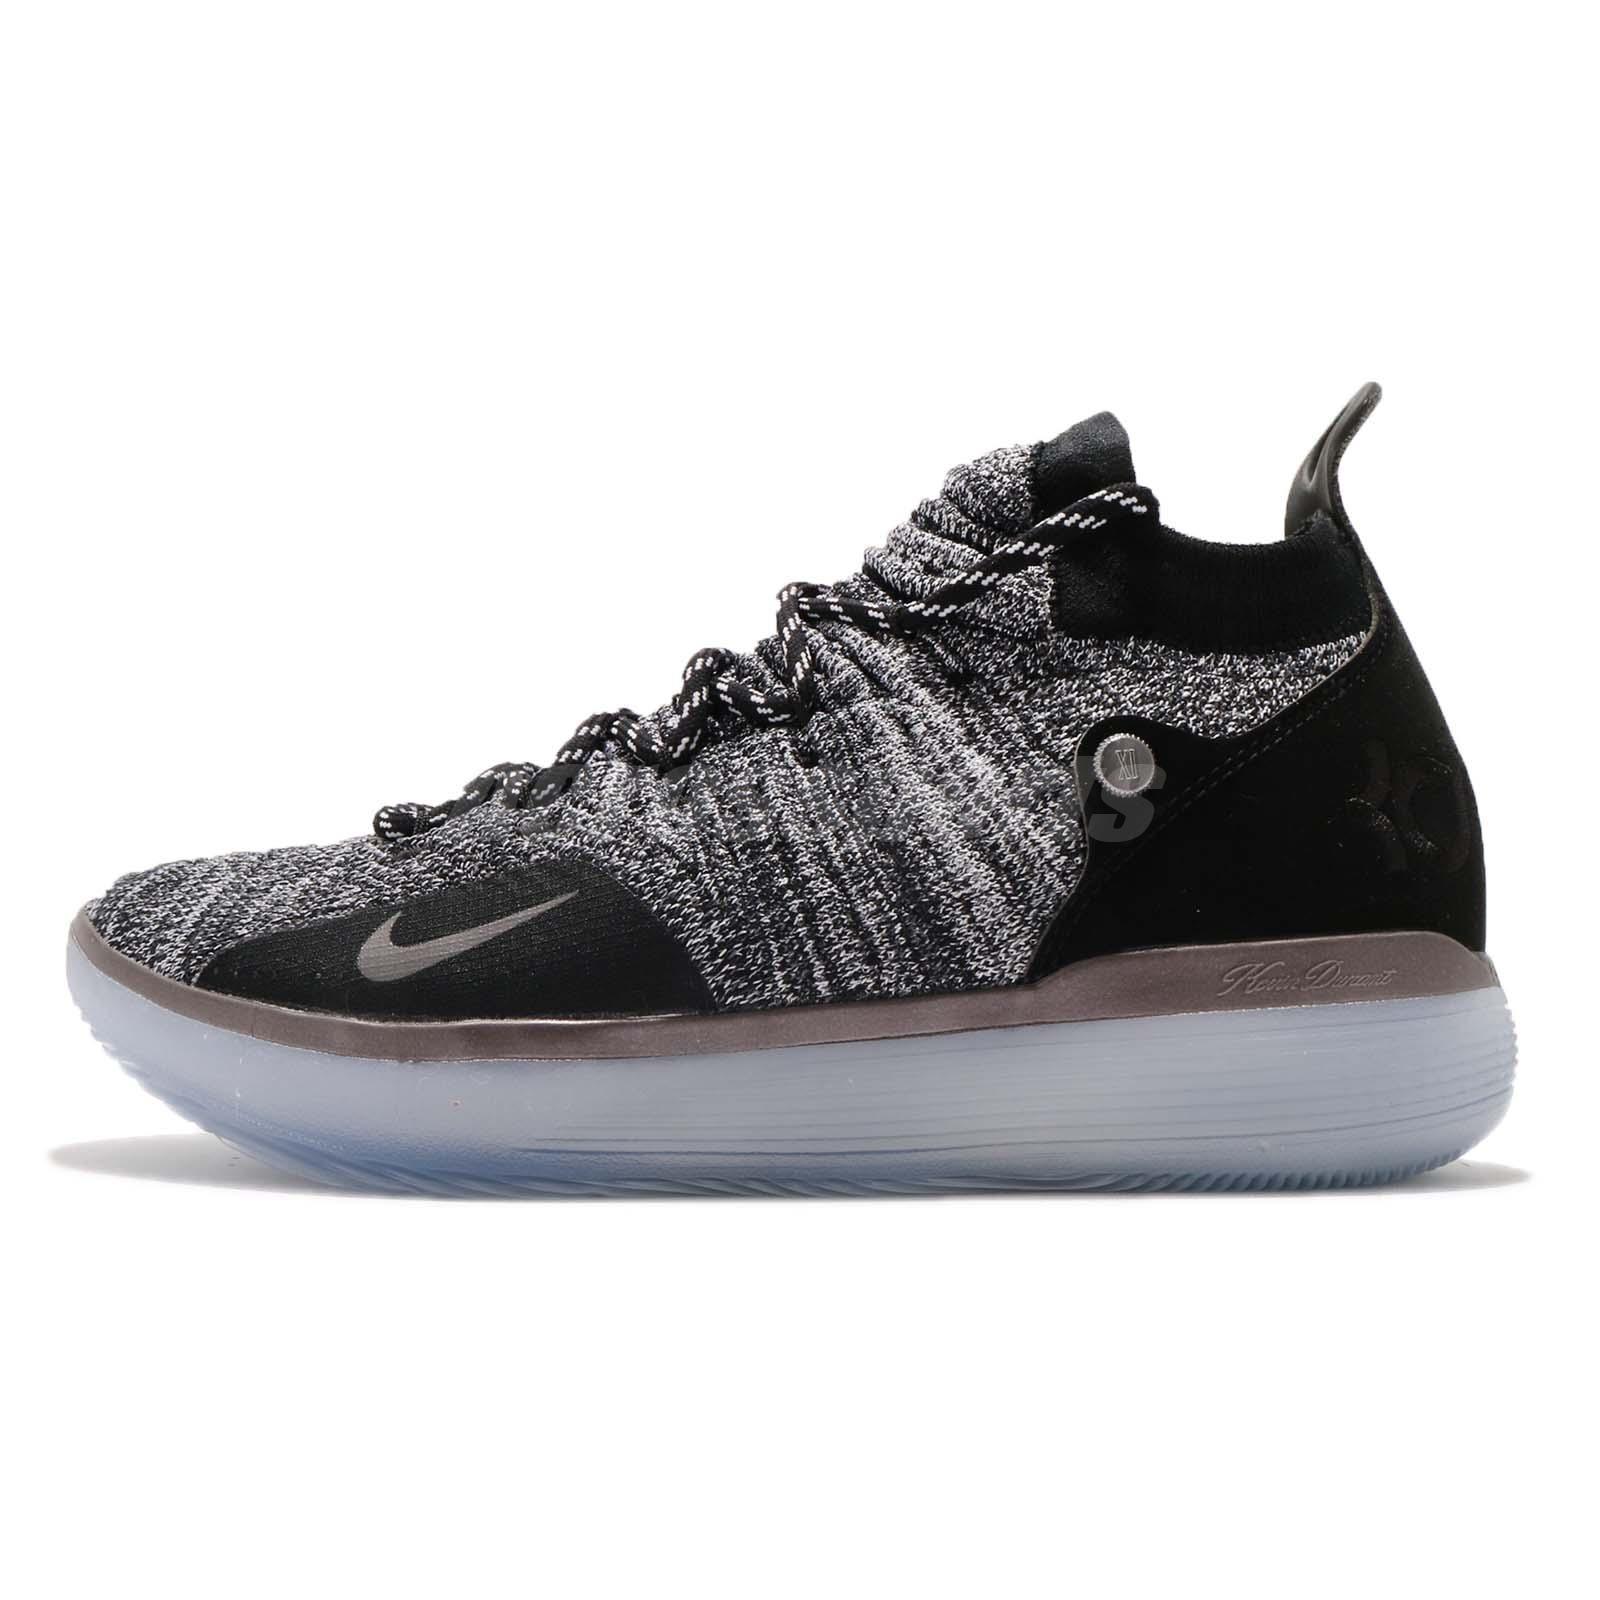 Nike Zoom KD 11 EP Still KD Black Grey Kevin Durant Basketball Shoes AO2605- 004 04385b6d7b6c